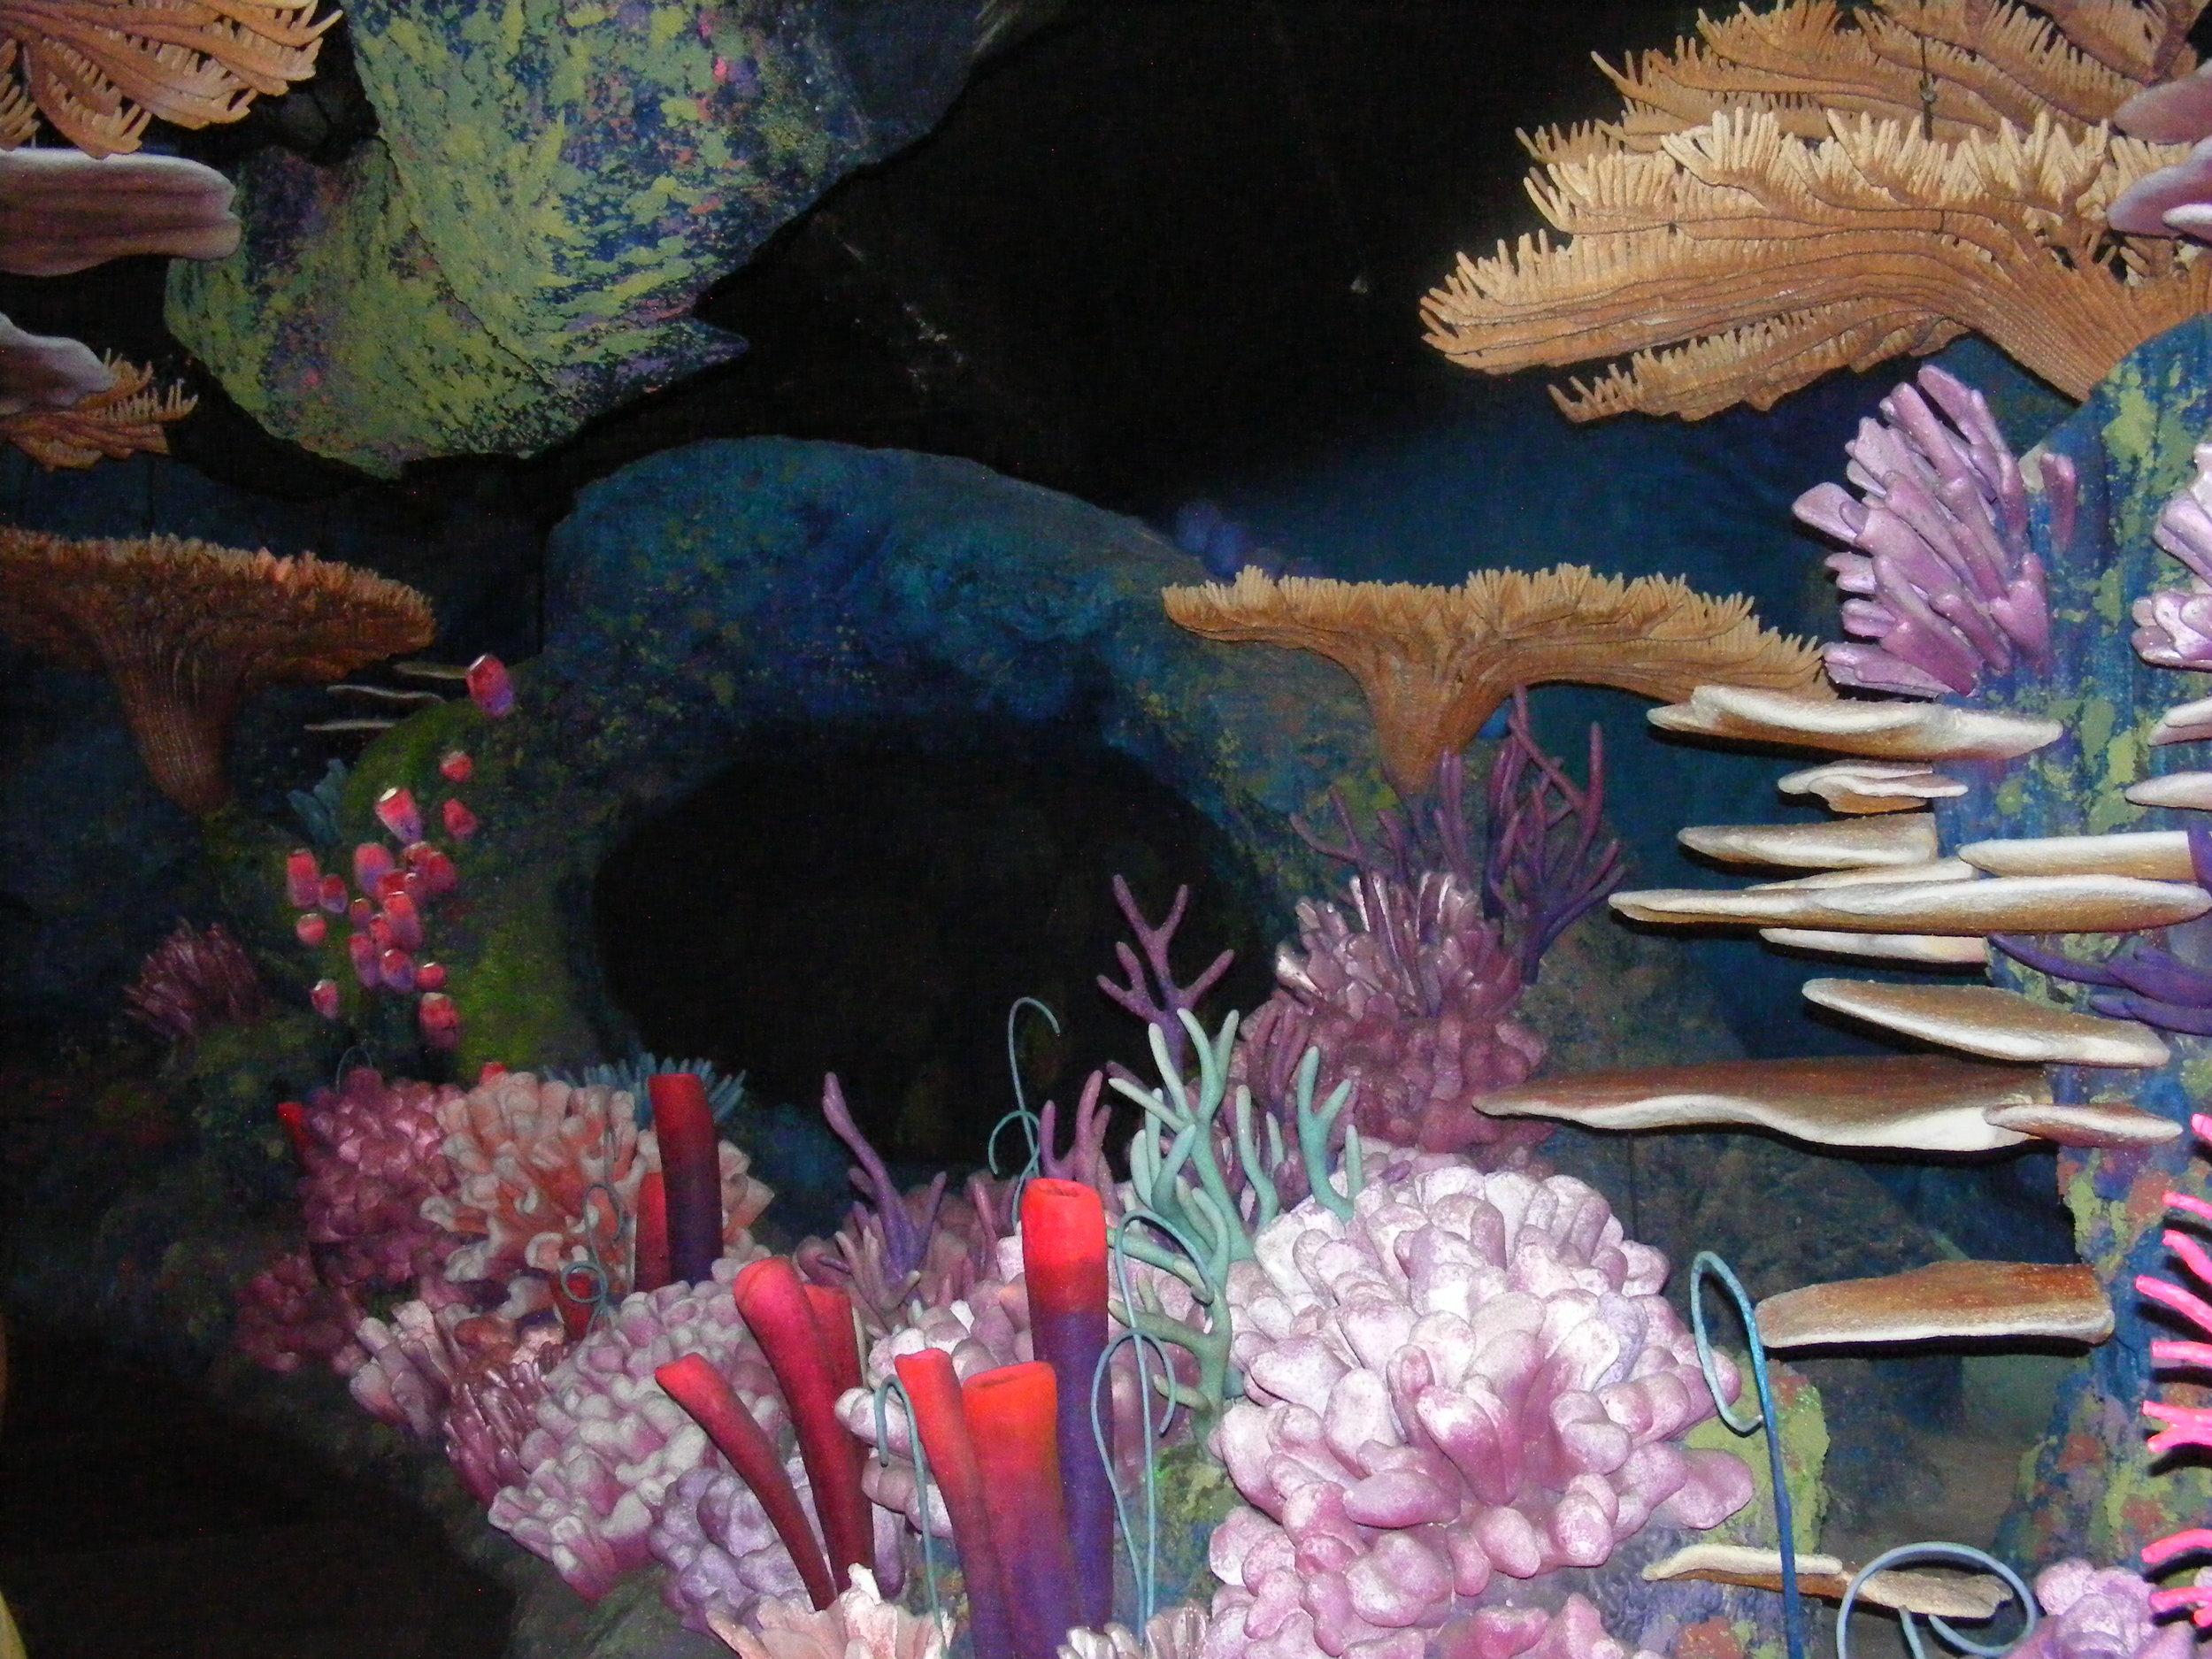 The Seas with Nemo and Friends, Future World, EPCOT